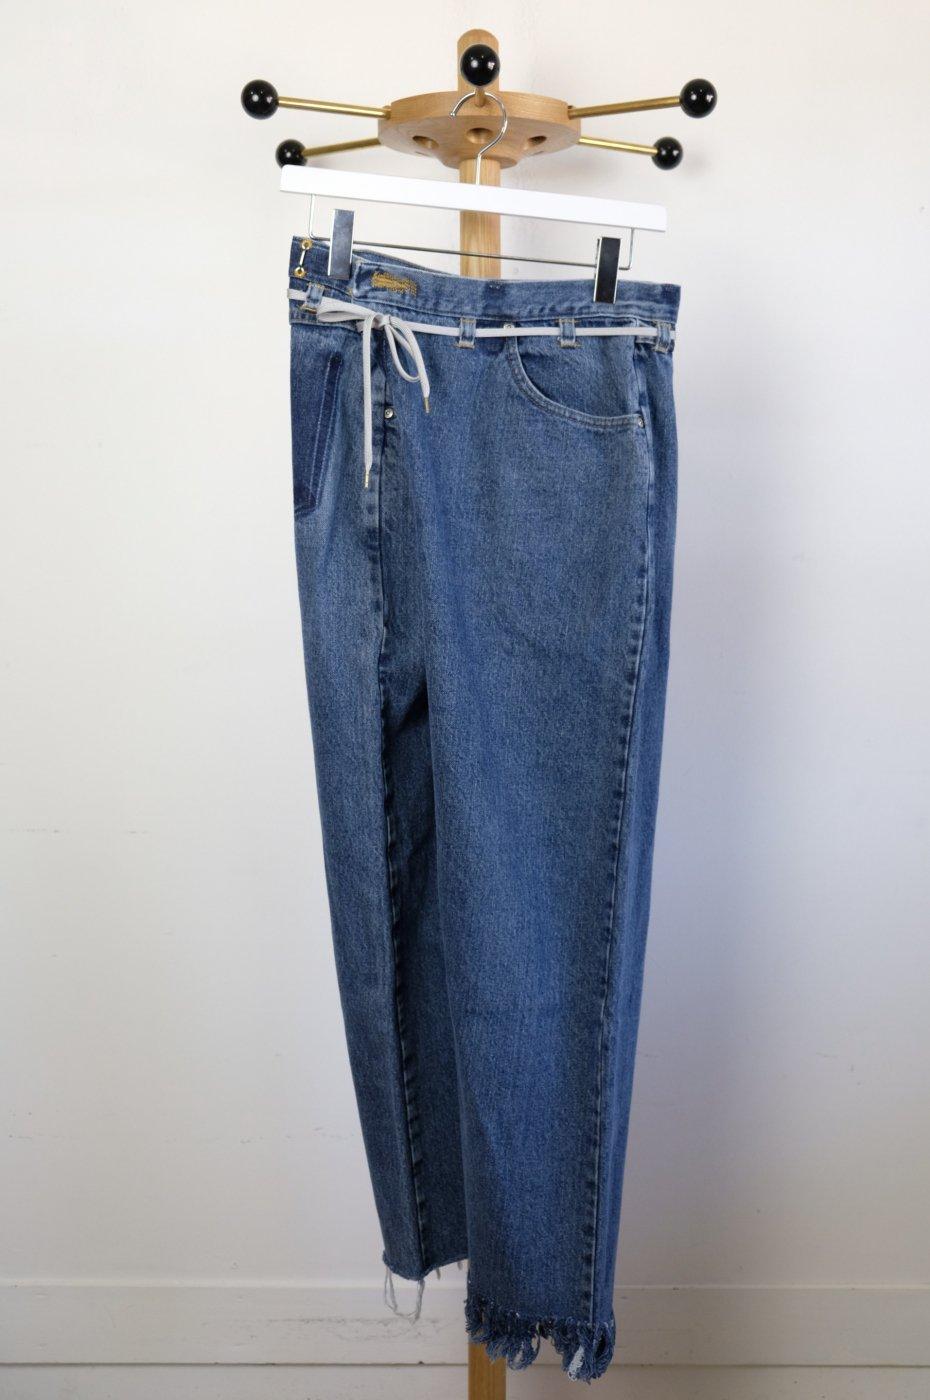 MAISON EUREKA メゾンエウレカ-VINTAGE REWORK BIGGY PANTS-BLUE-#2